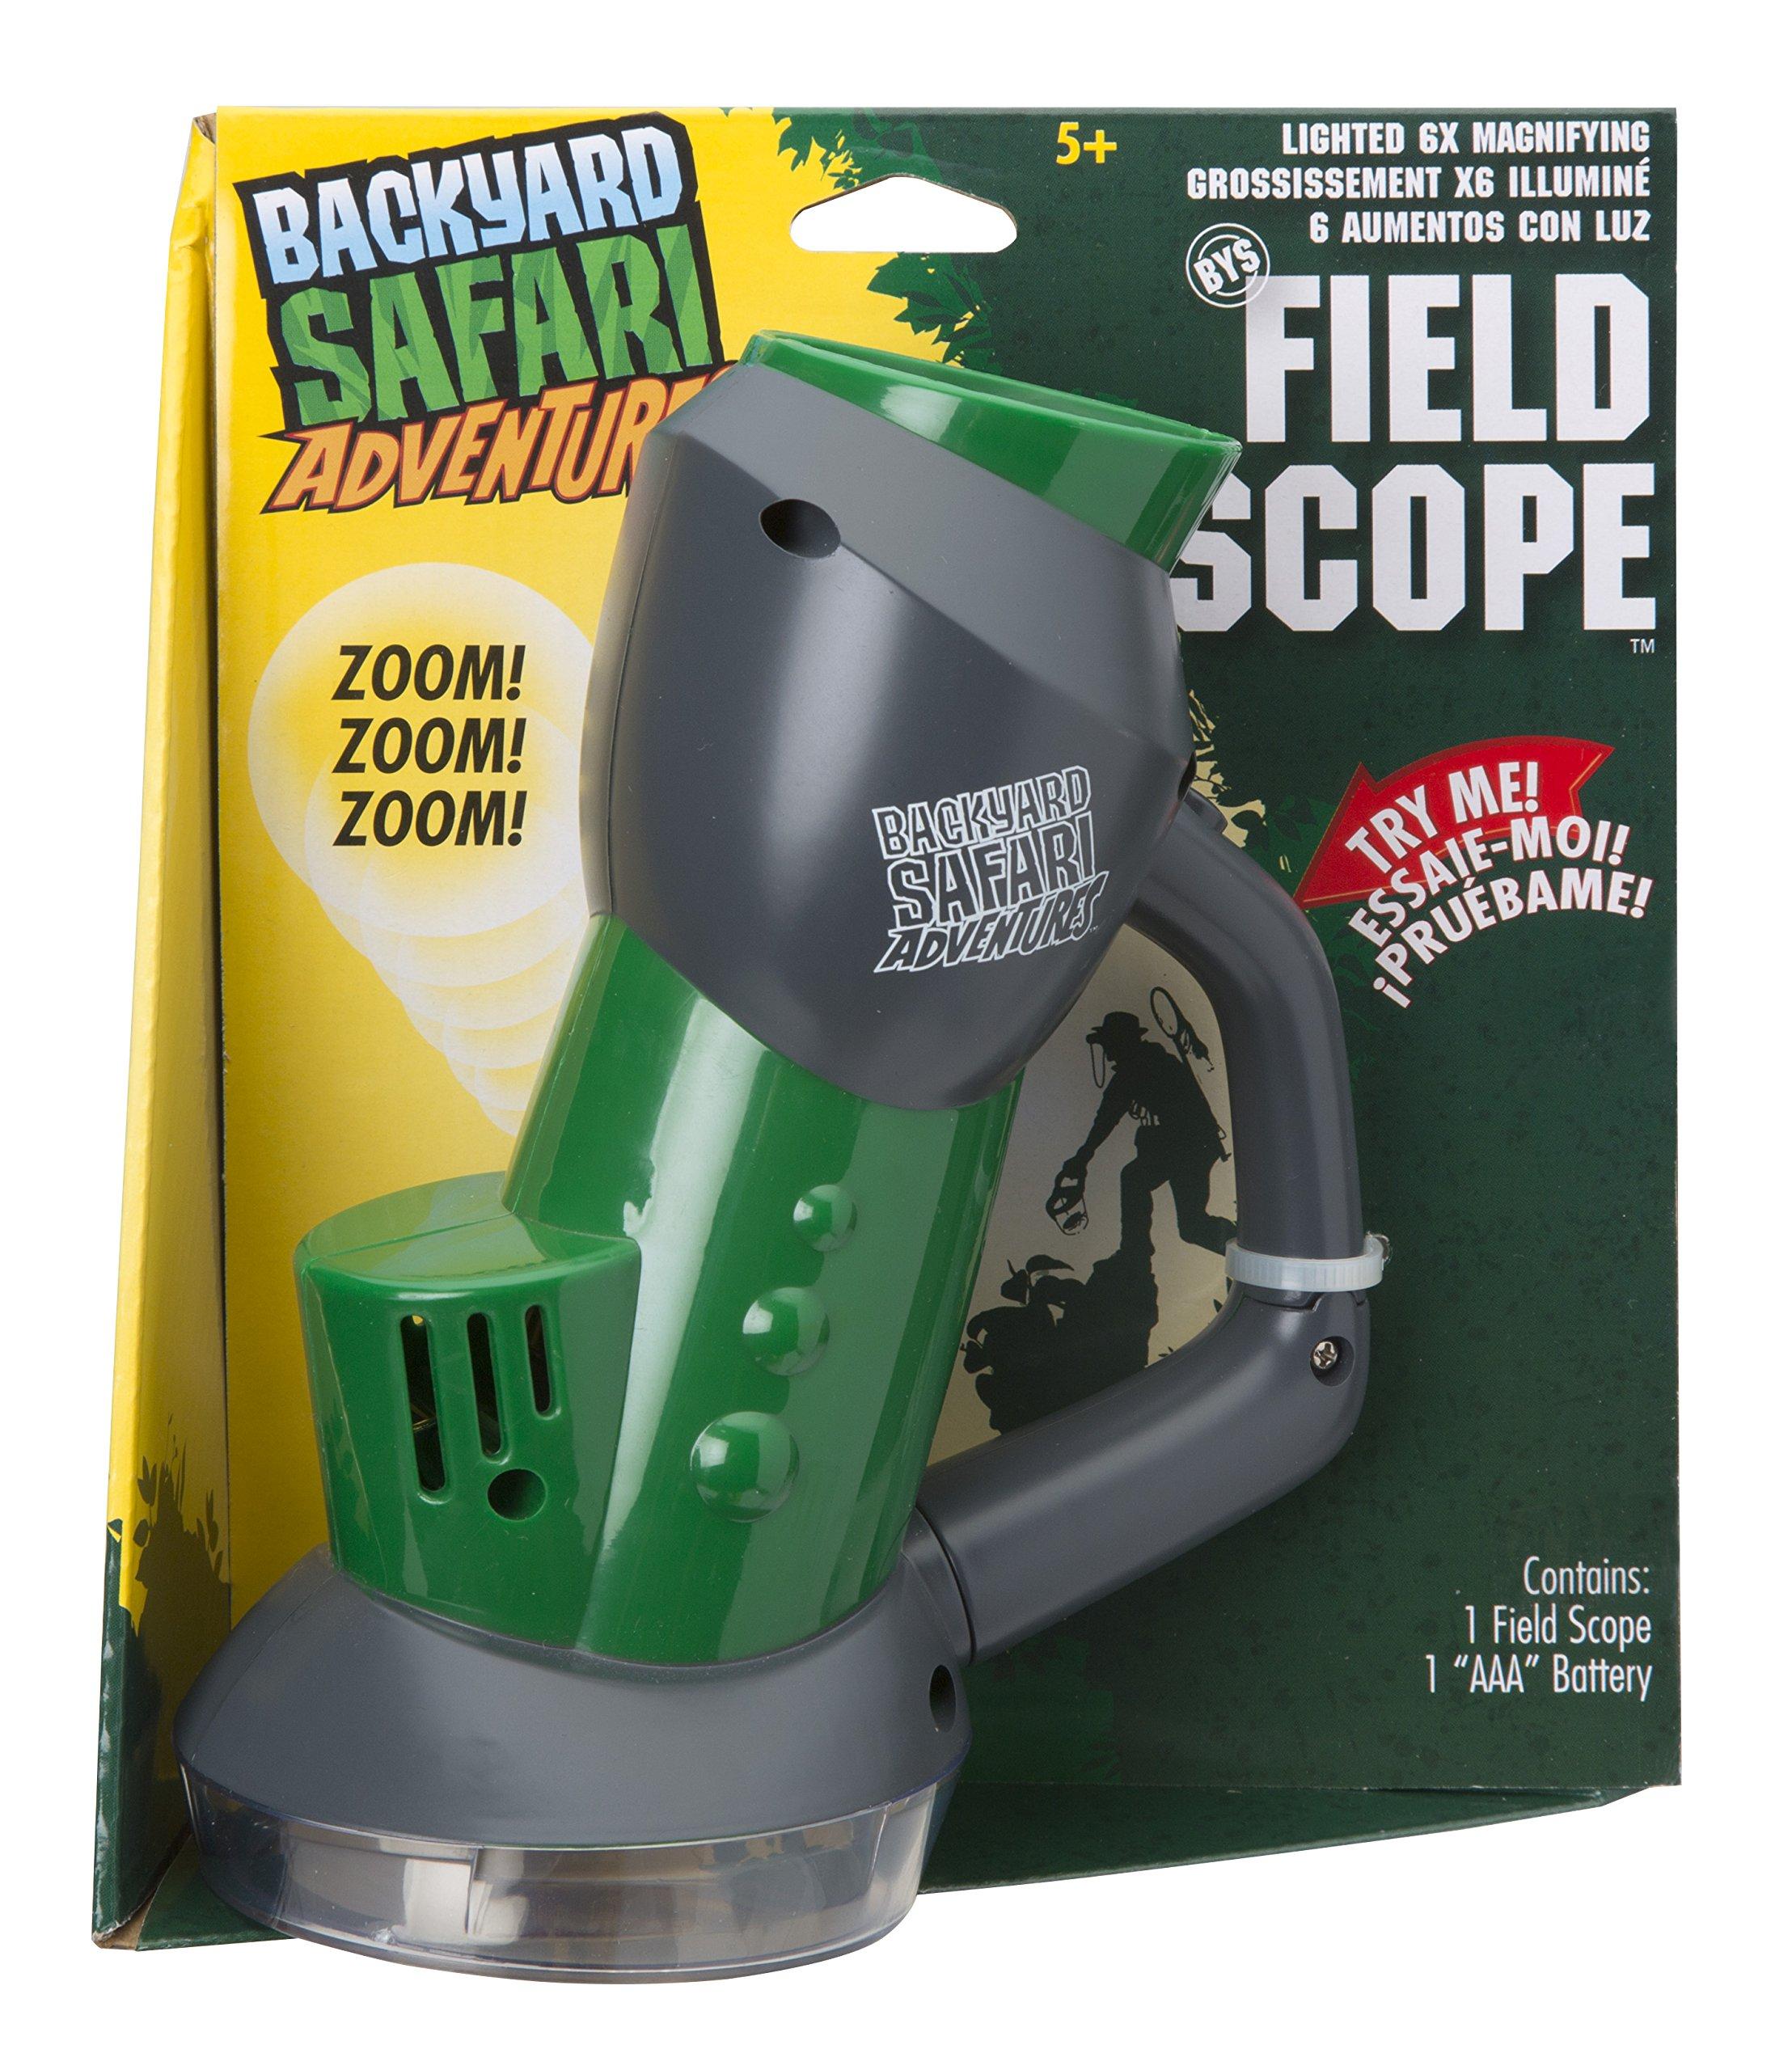 backyard safari field scope trap bugs under the scope for up close